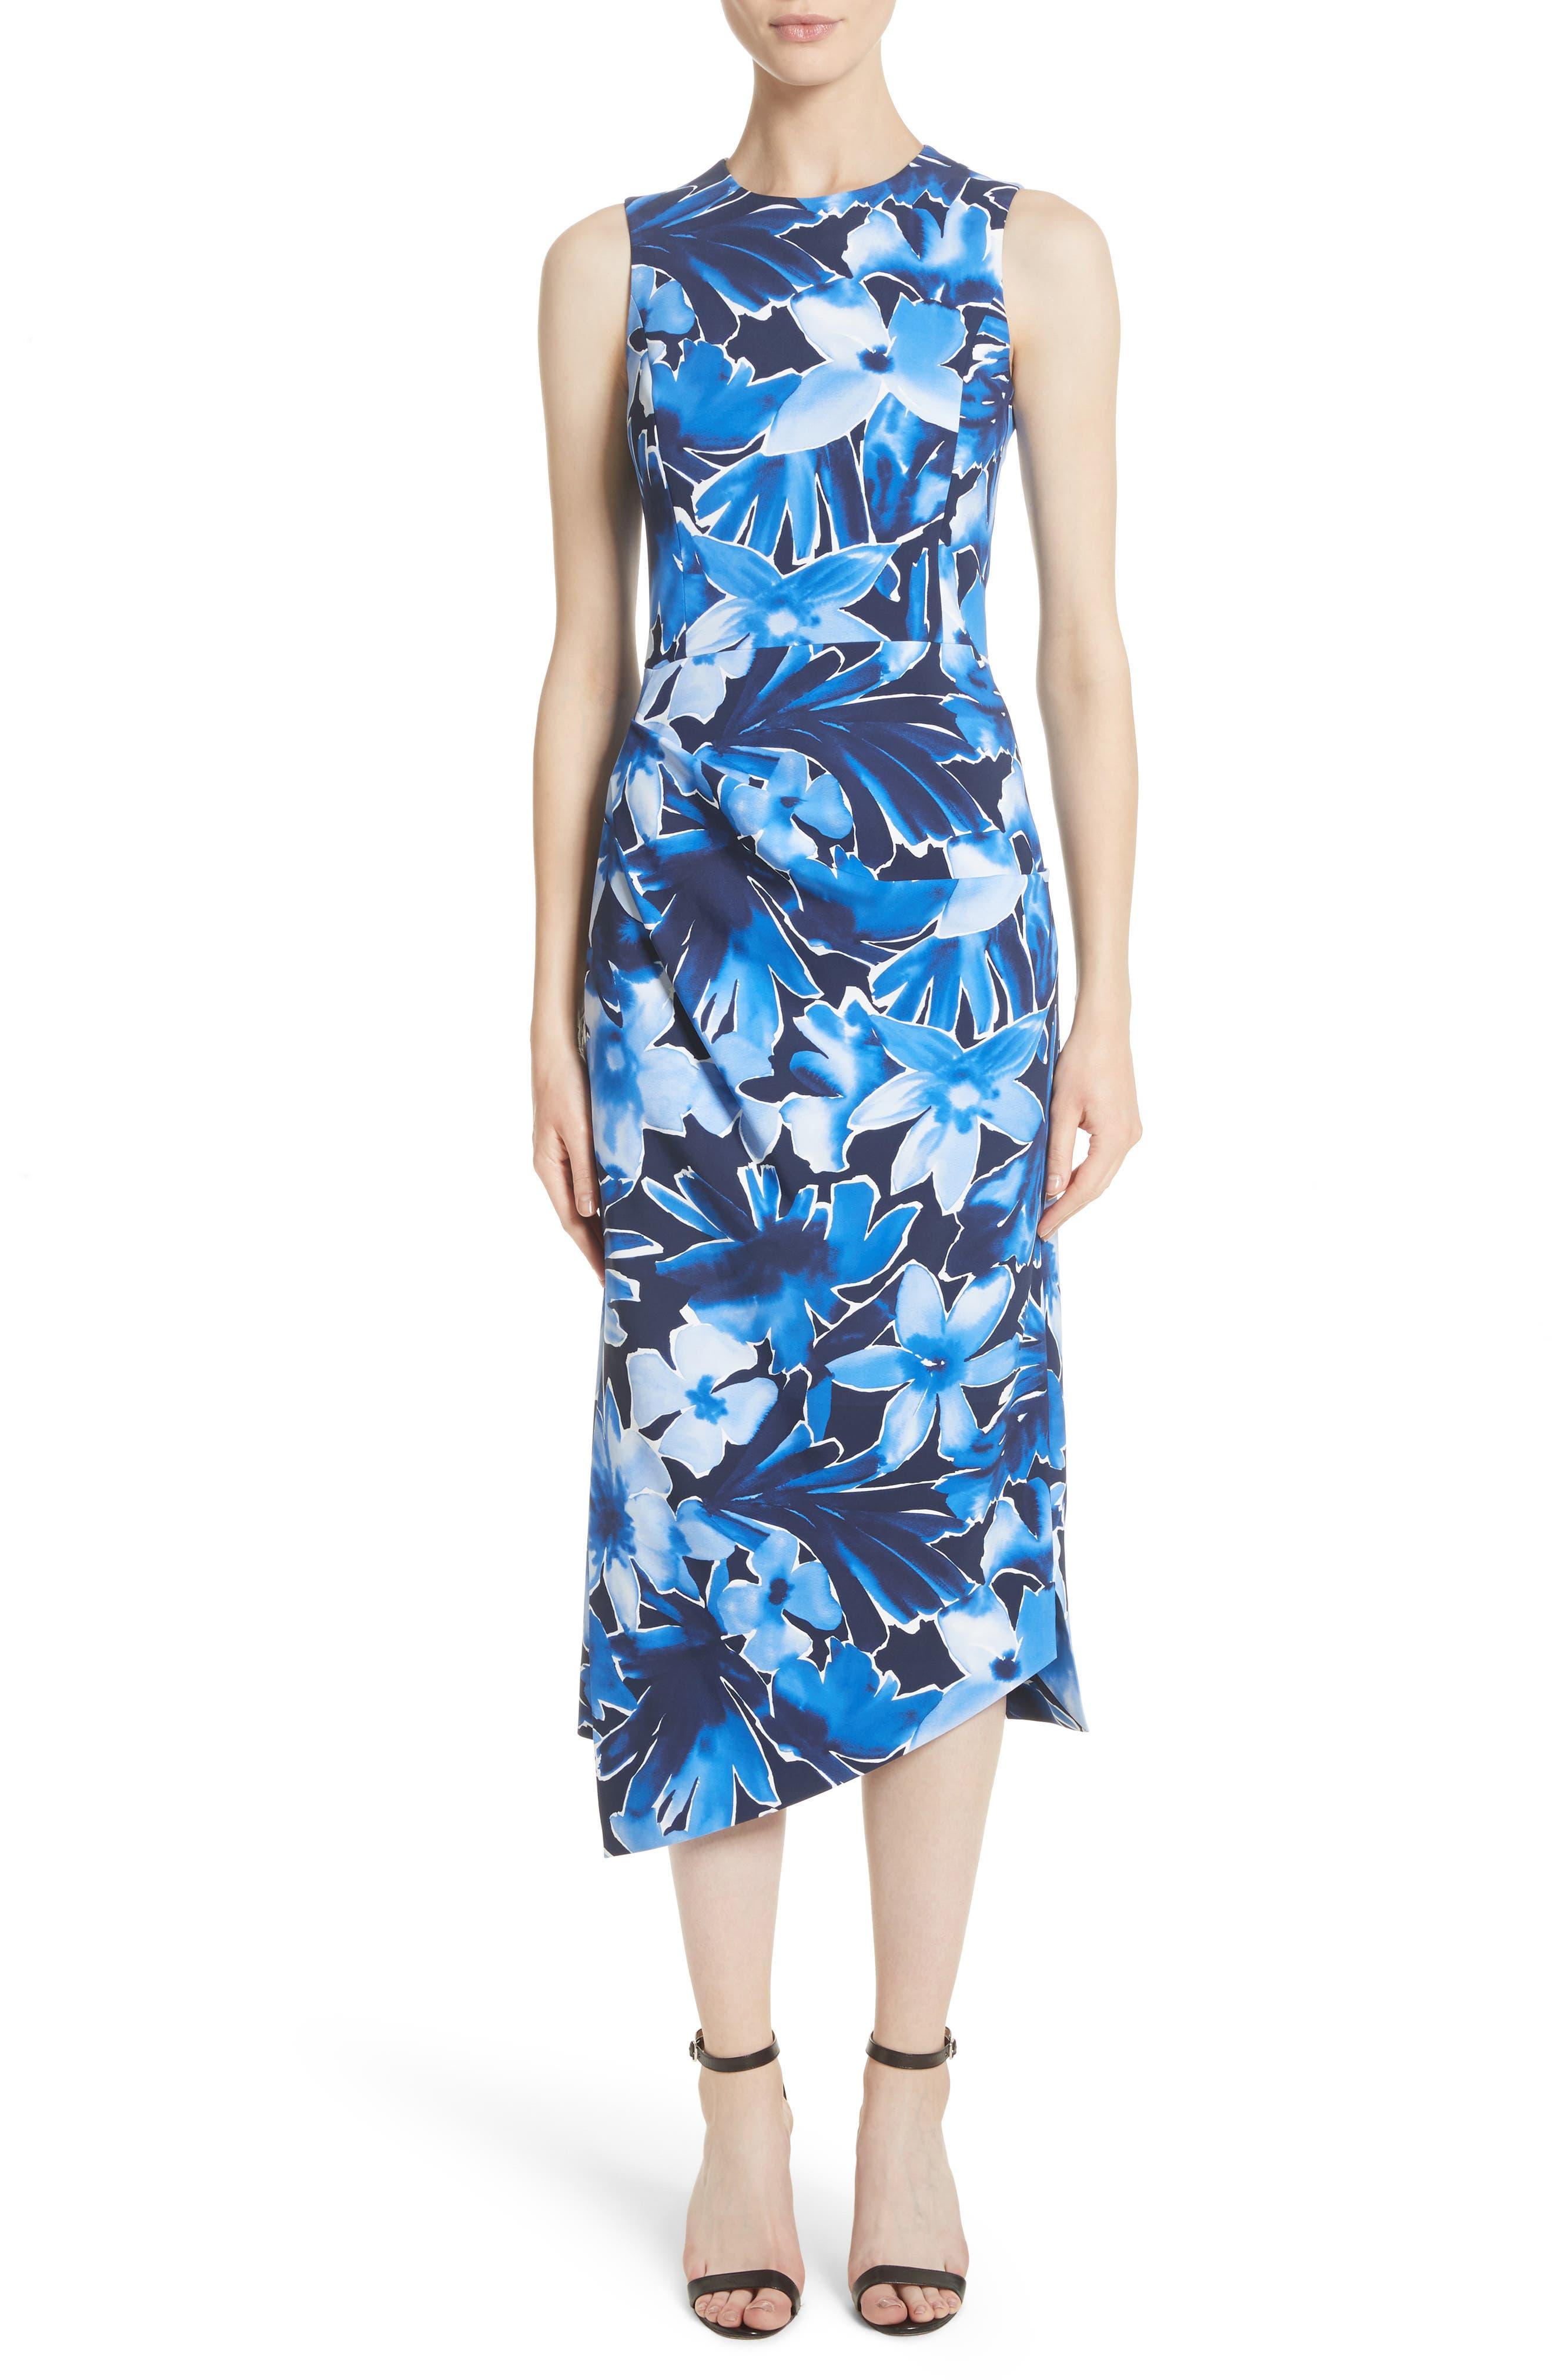 Michael Kors Draped Floral Print Sheath Dress